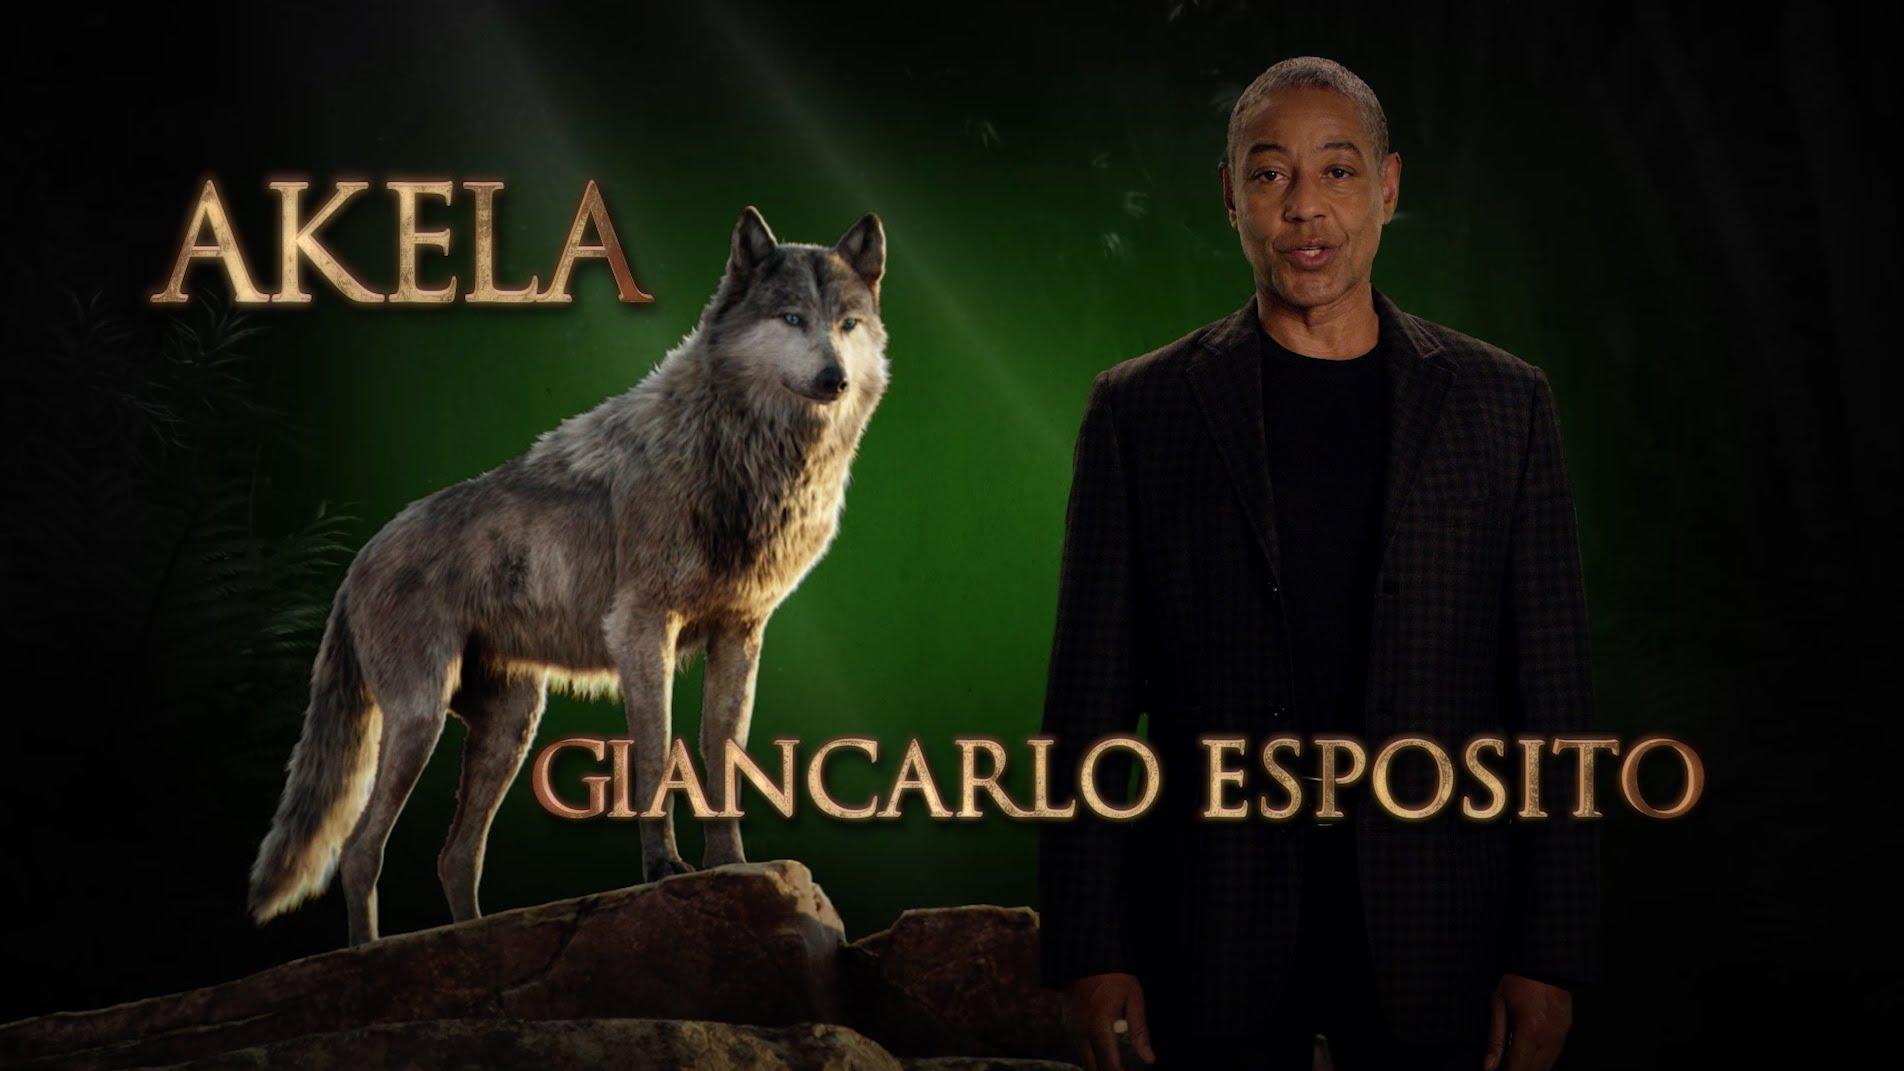 Giancarlo Esposito is Akela – Disney's The Jungle Book